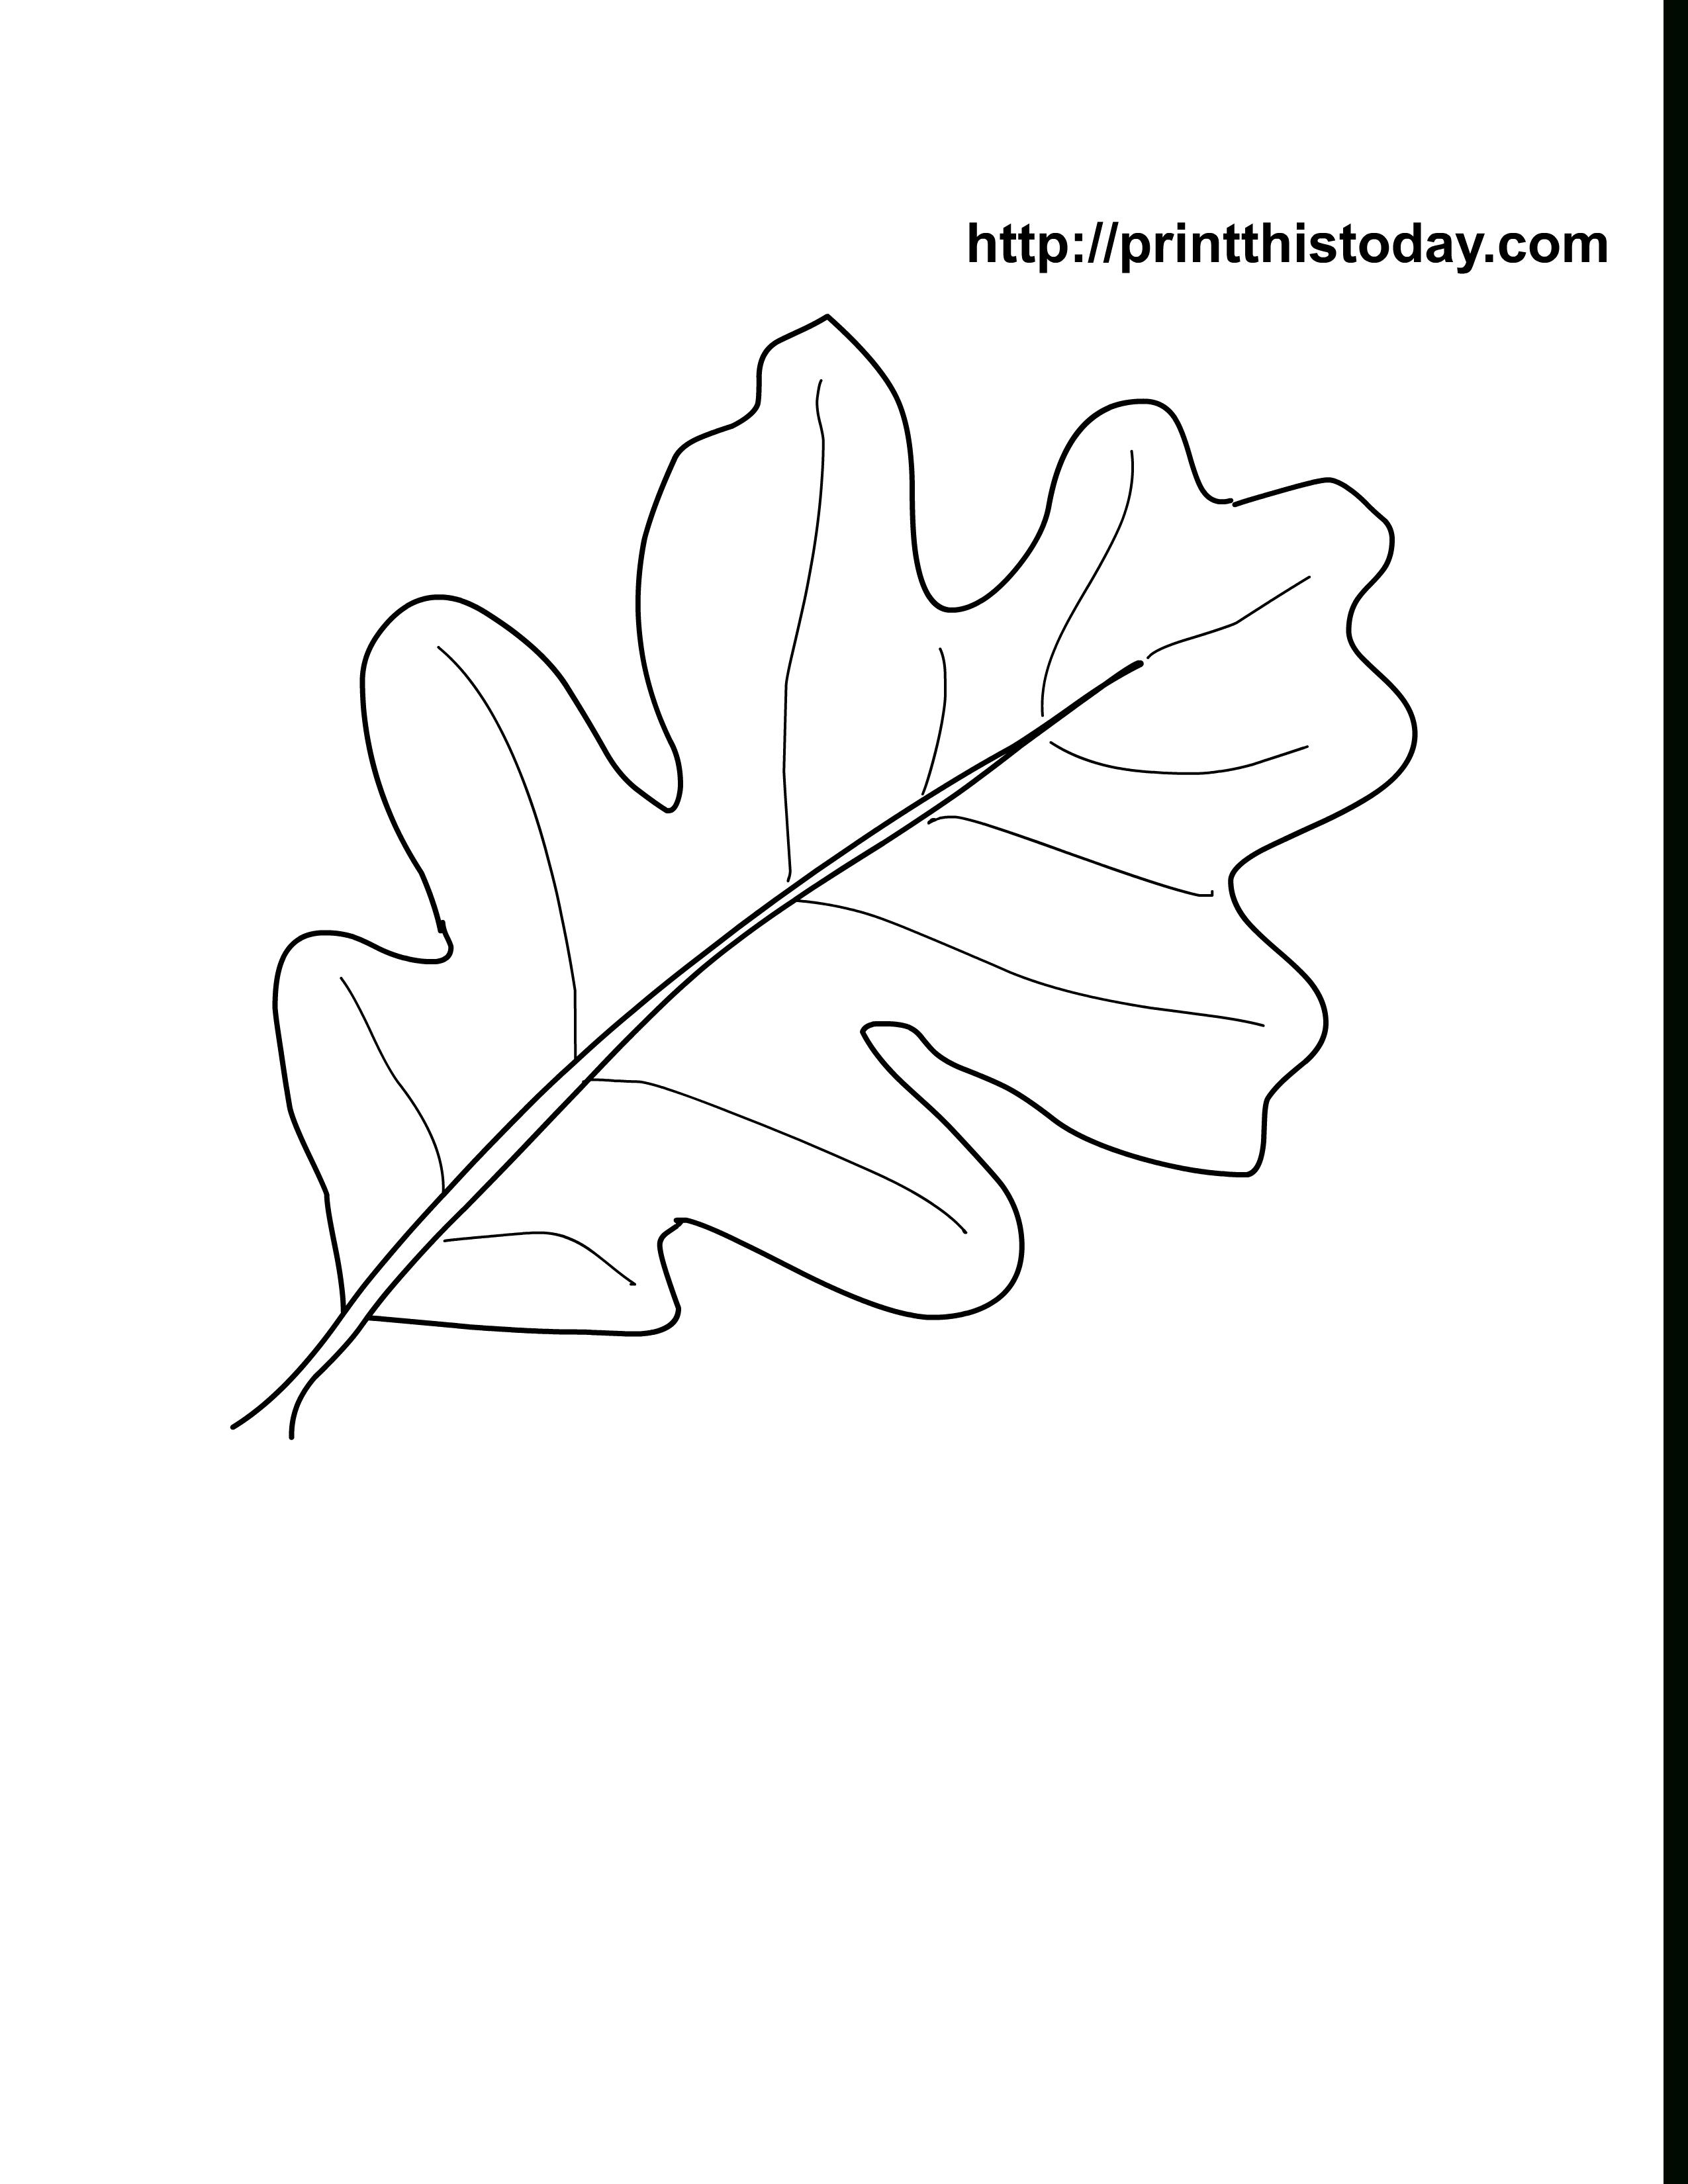 Oak Leaves Coloring Pages Printable | Craft Ideas | Leaf Coloring - Free Printable Leaves